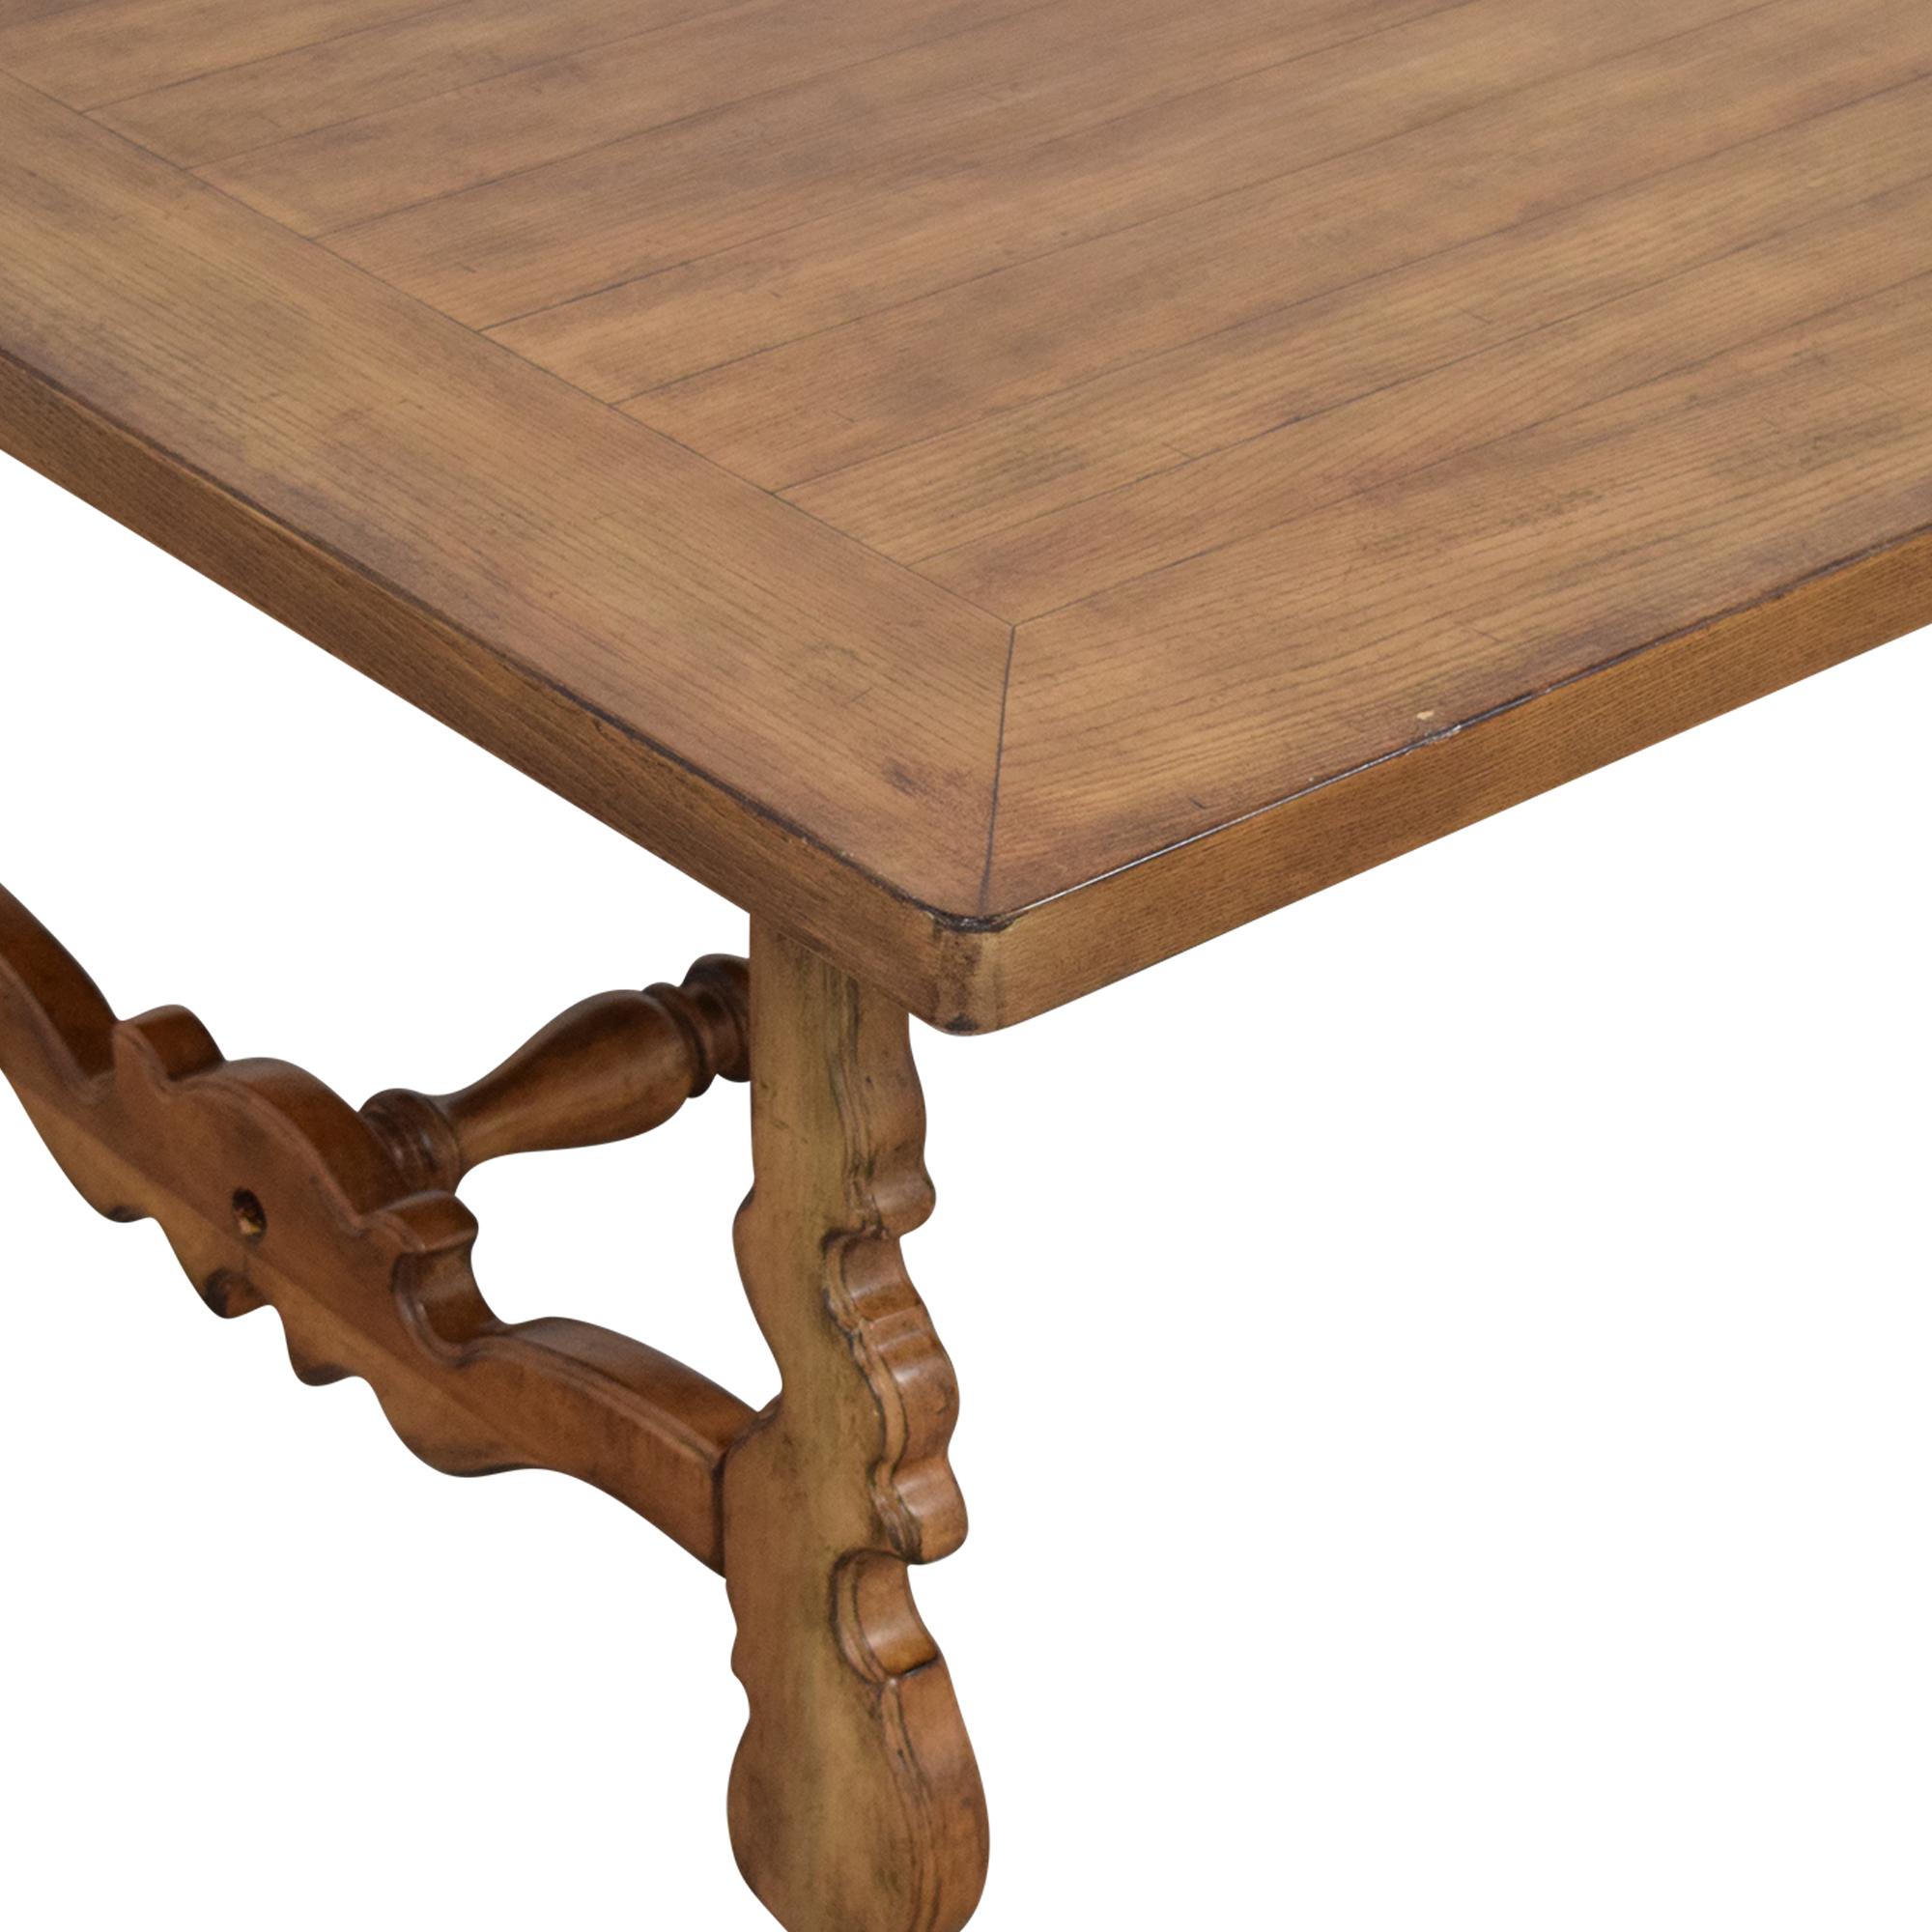 Hooker Furniture Hooker Coffee Table dimensions